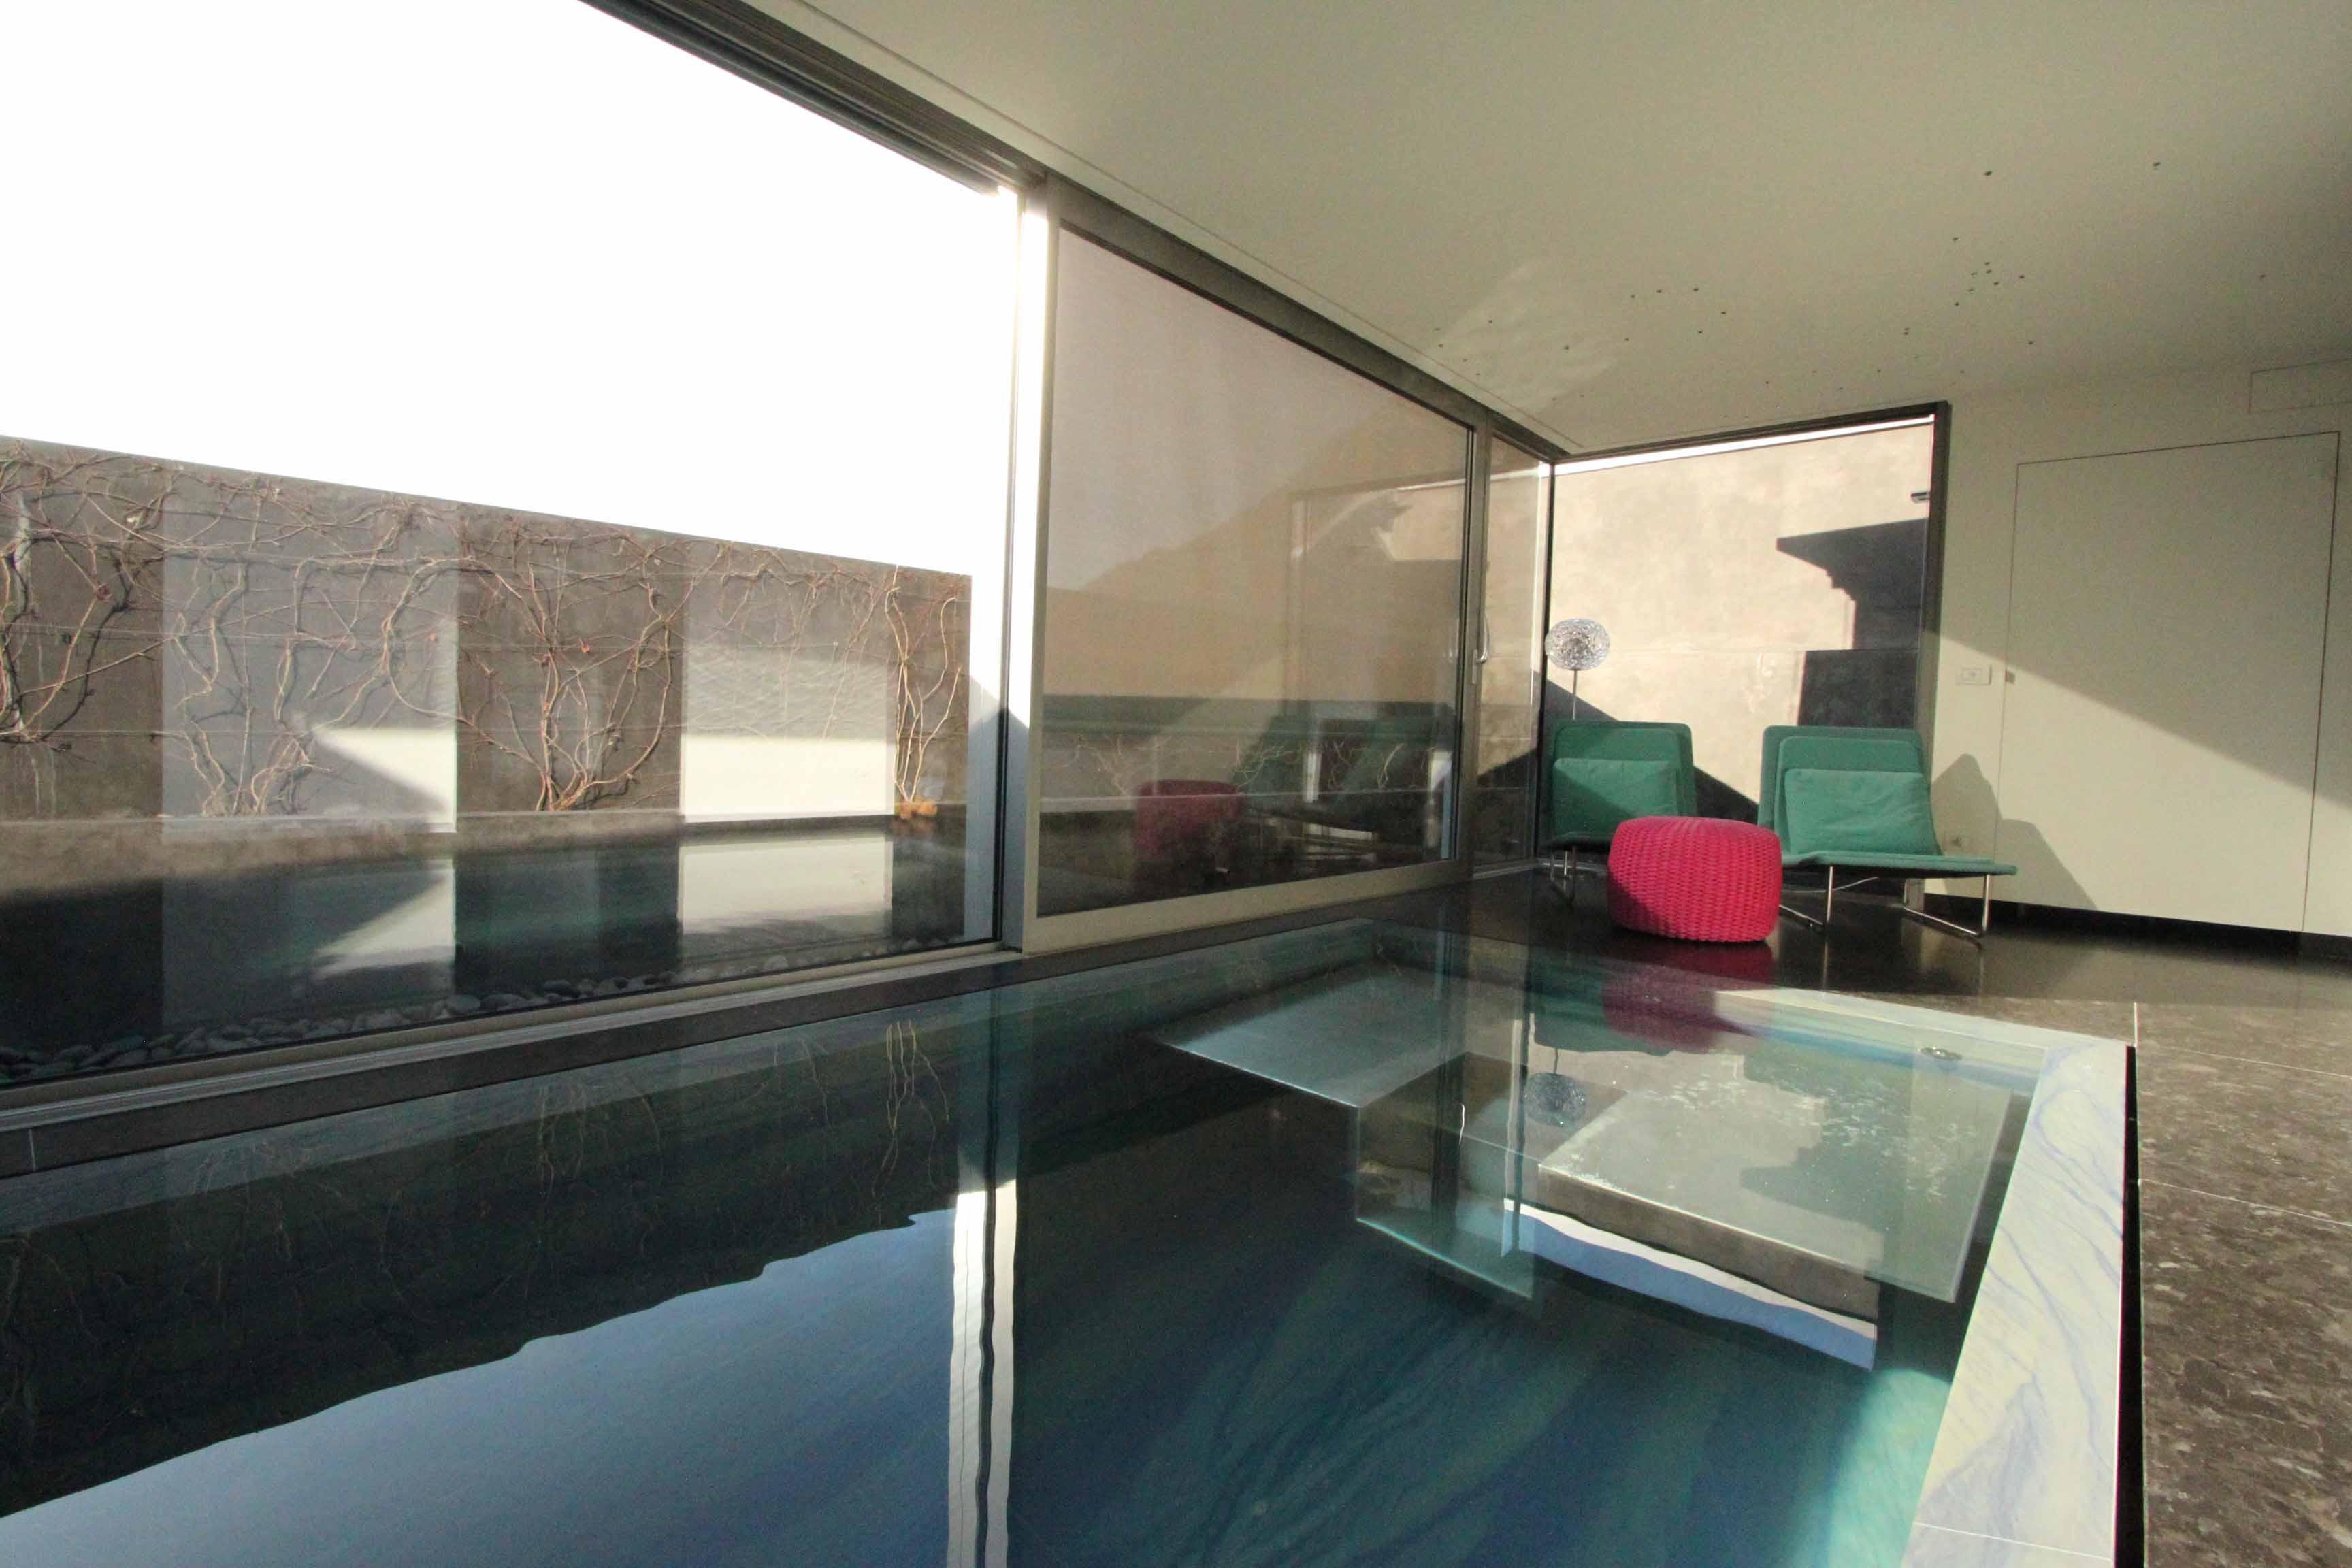 studio_balini_architettura_bergamo 12